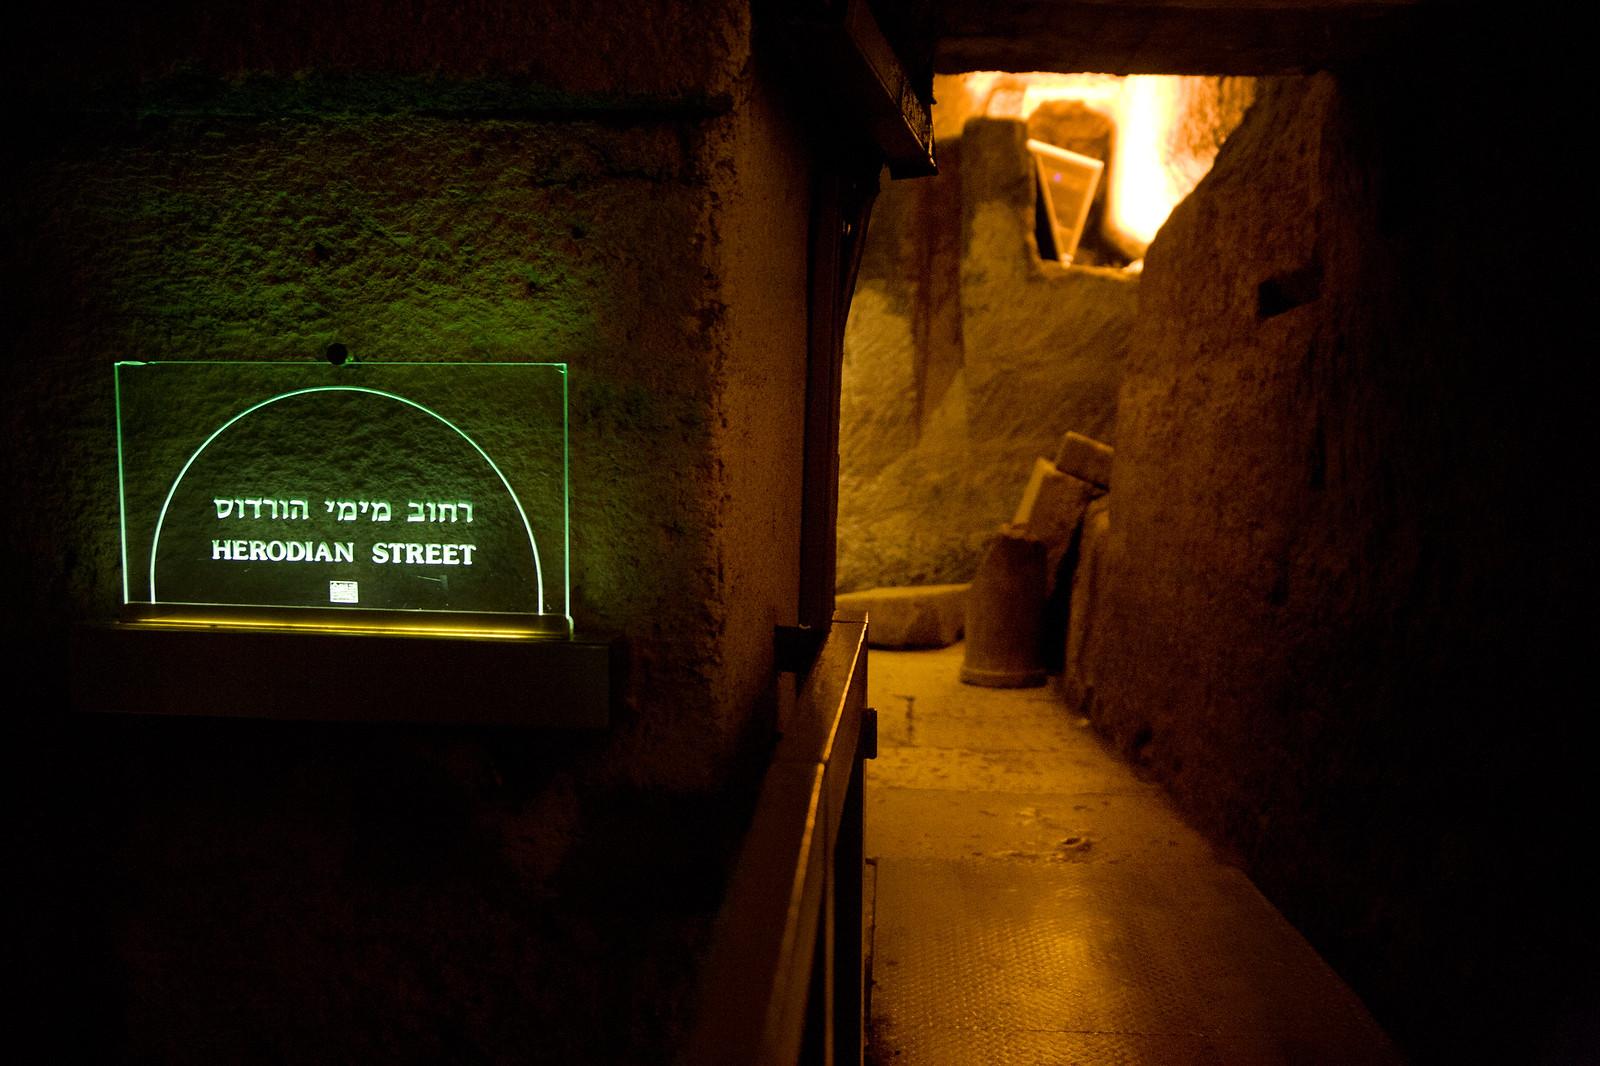 Jerusalem_Western Wall Tunnels_1_Noam Chen_IMOT